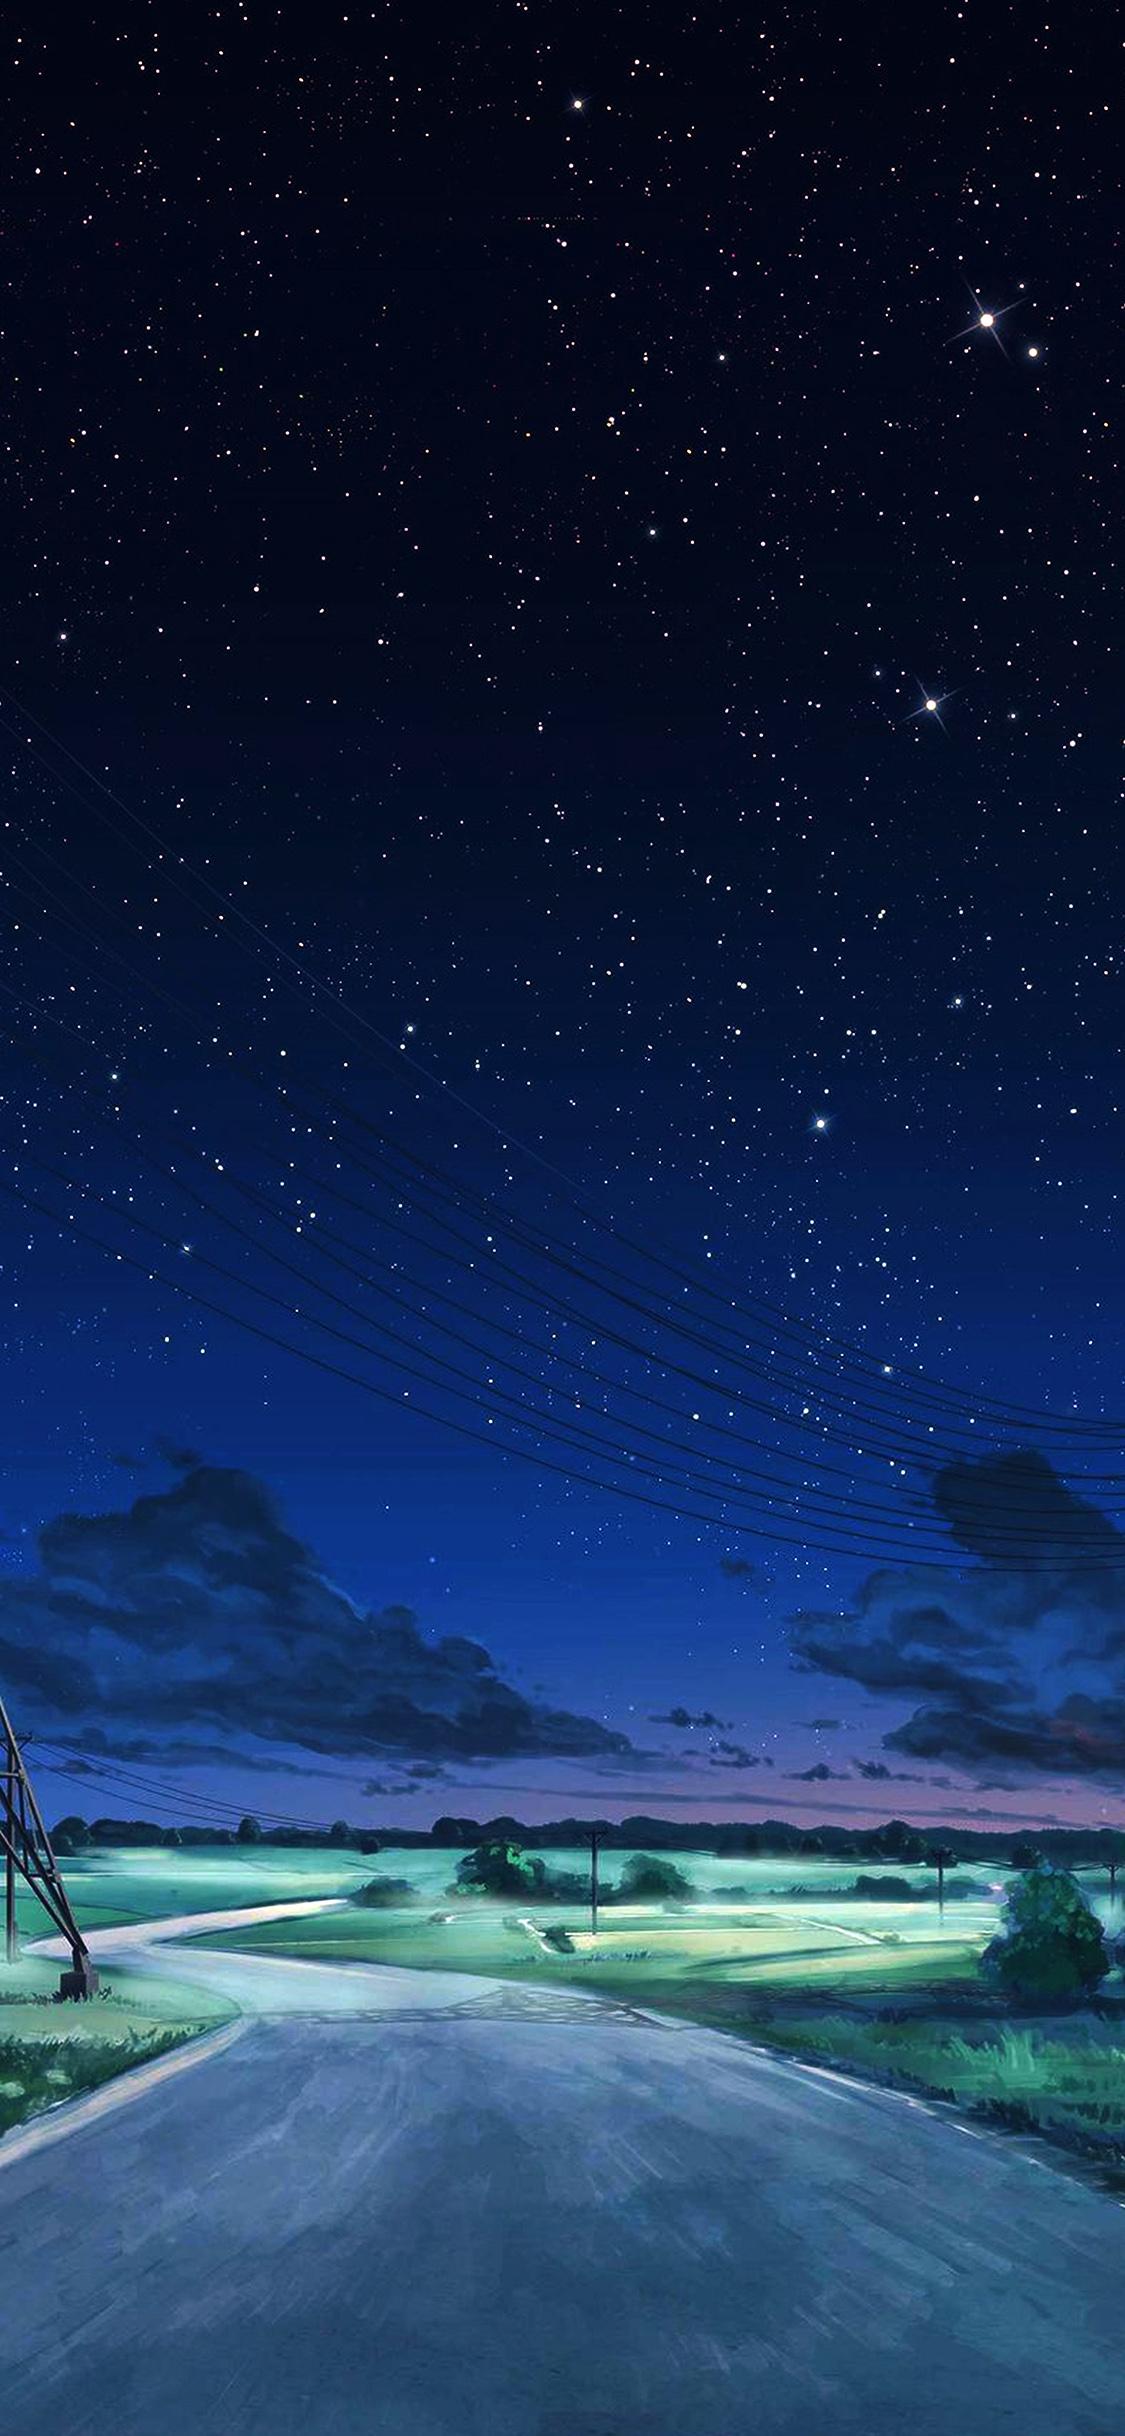 Hd Christmas Wallpapers 1080p Aw16 Arseniy Chebynkin Night Sky Star Blue Illustration